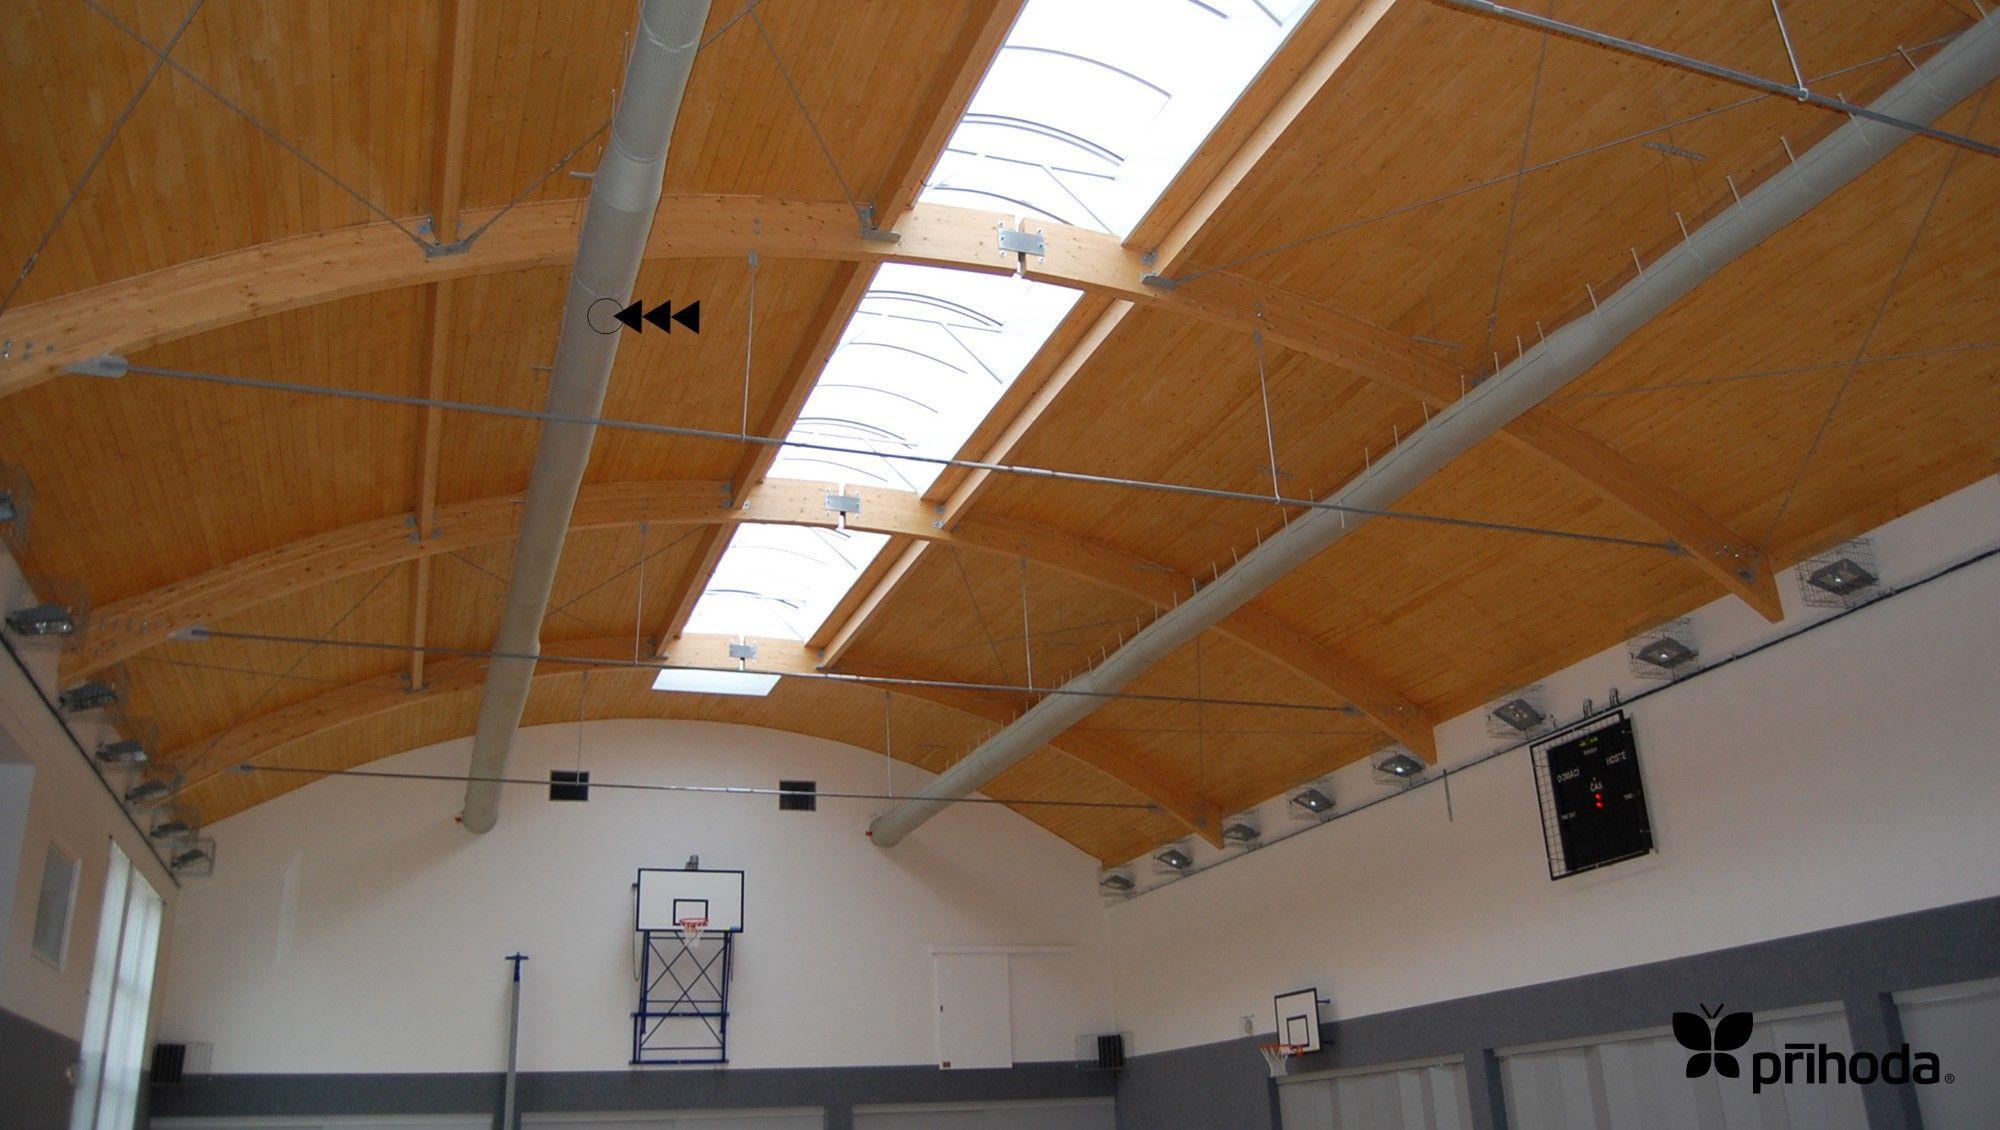 Prihoda Fresh Air Ventilation Fabric Ducting in a large